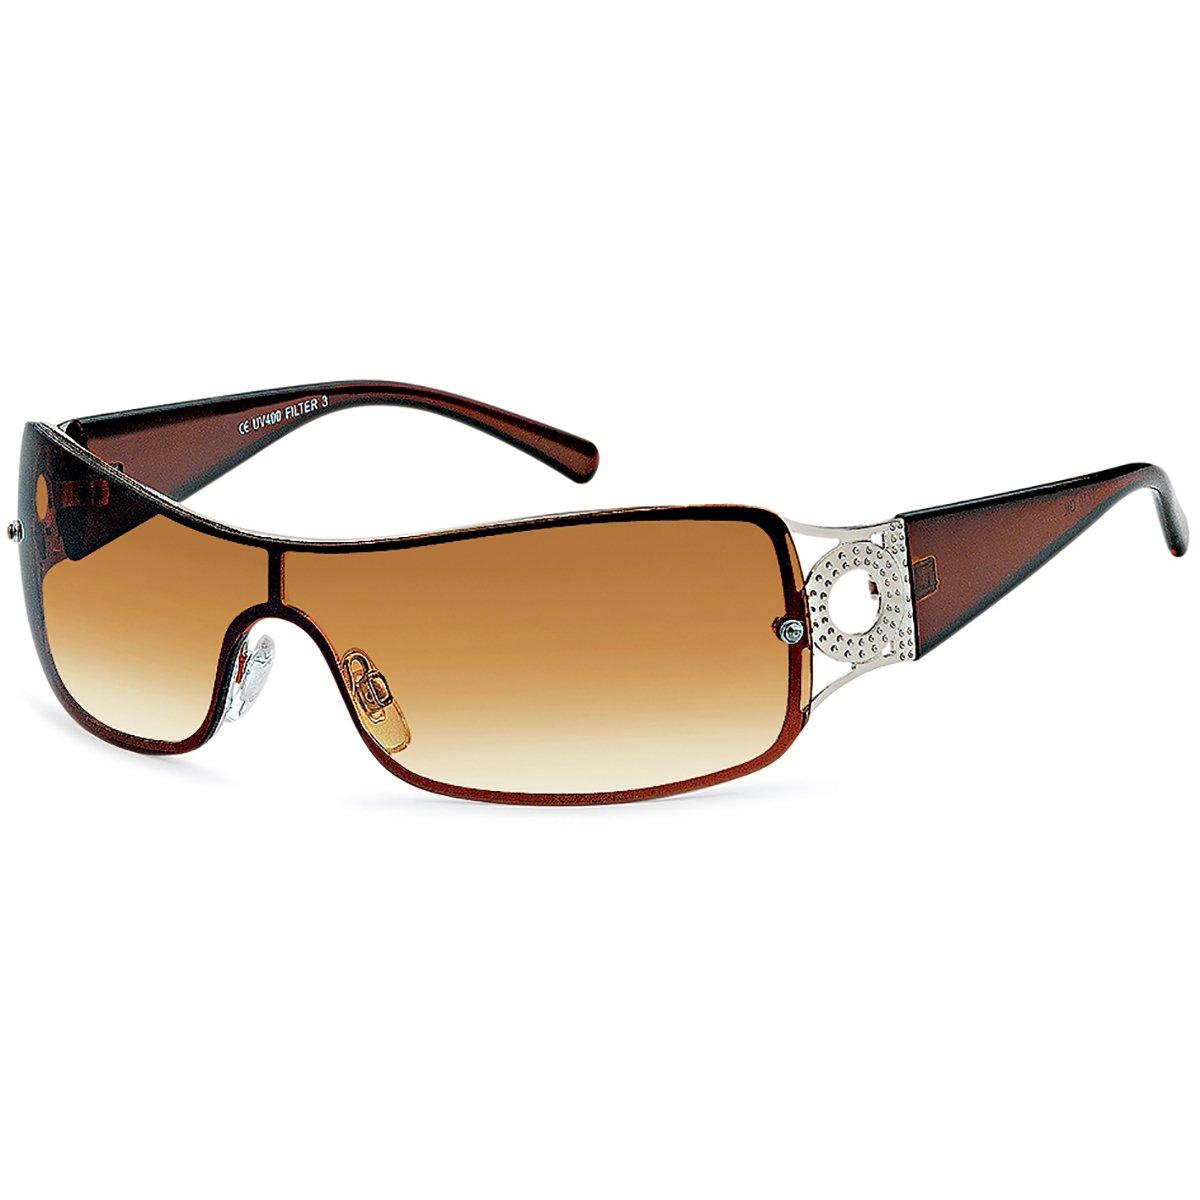 Monocapas Biker Gafas De Sol Gafas De Aviador Gafas De Sol ...